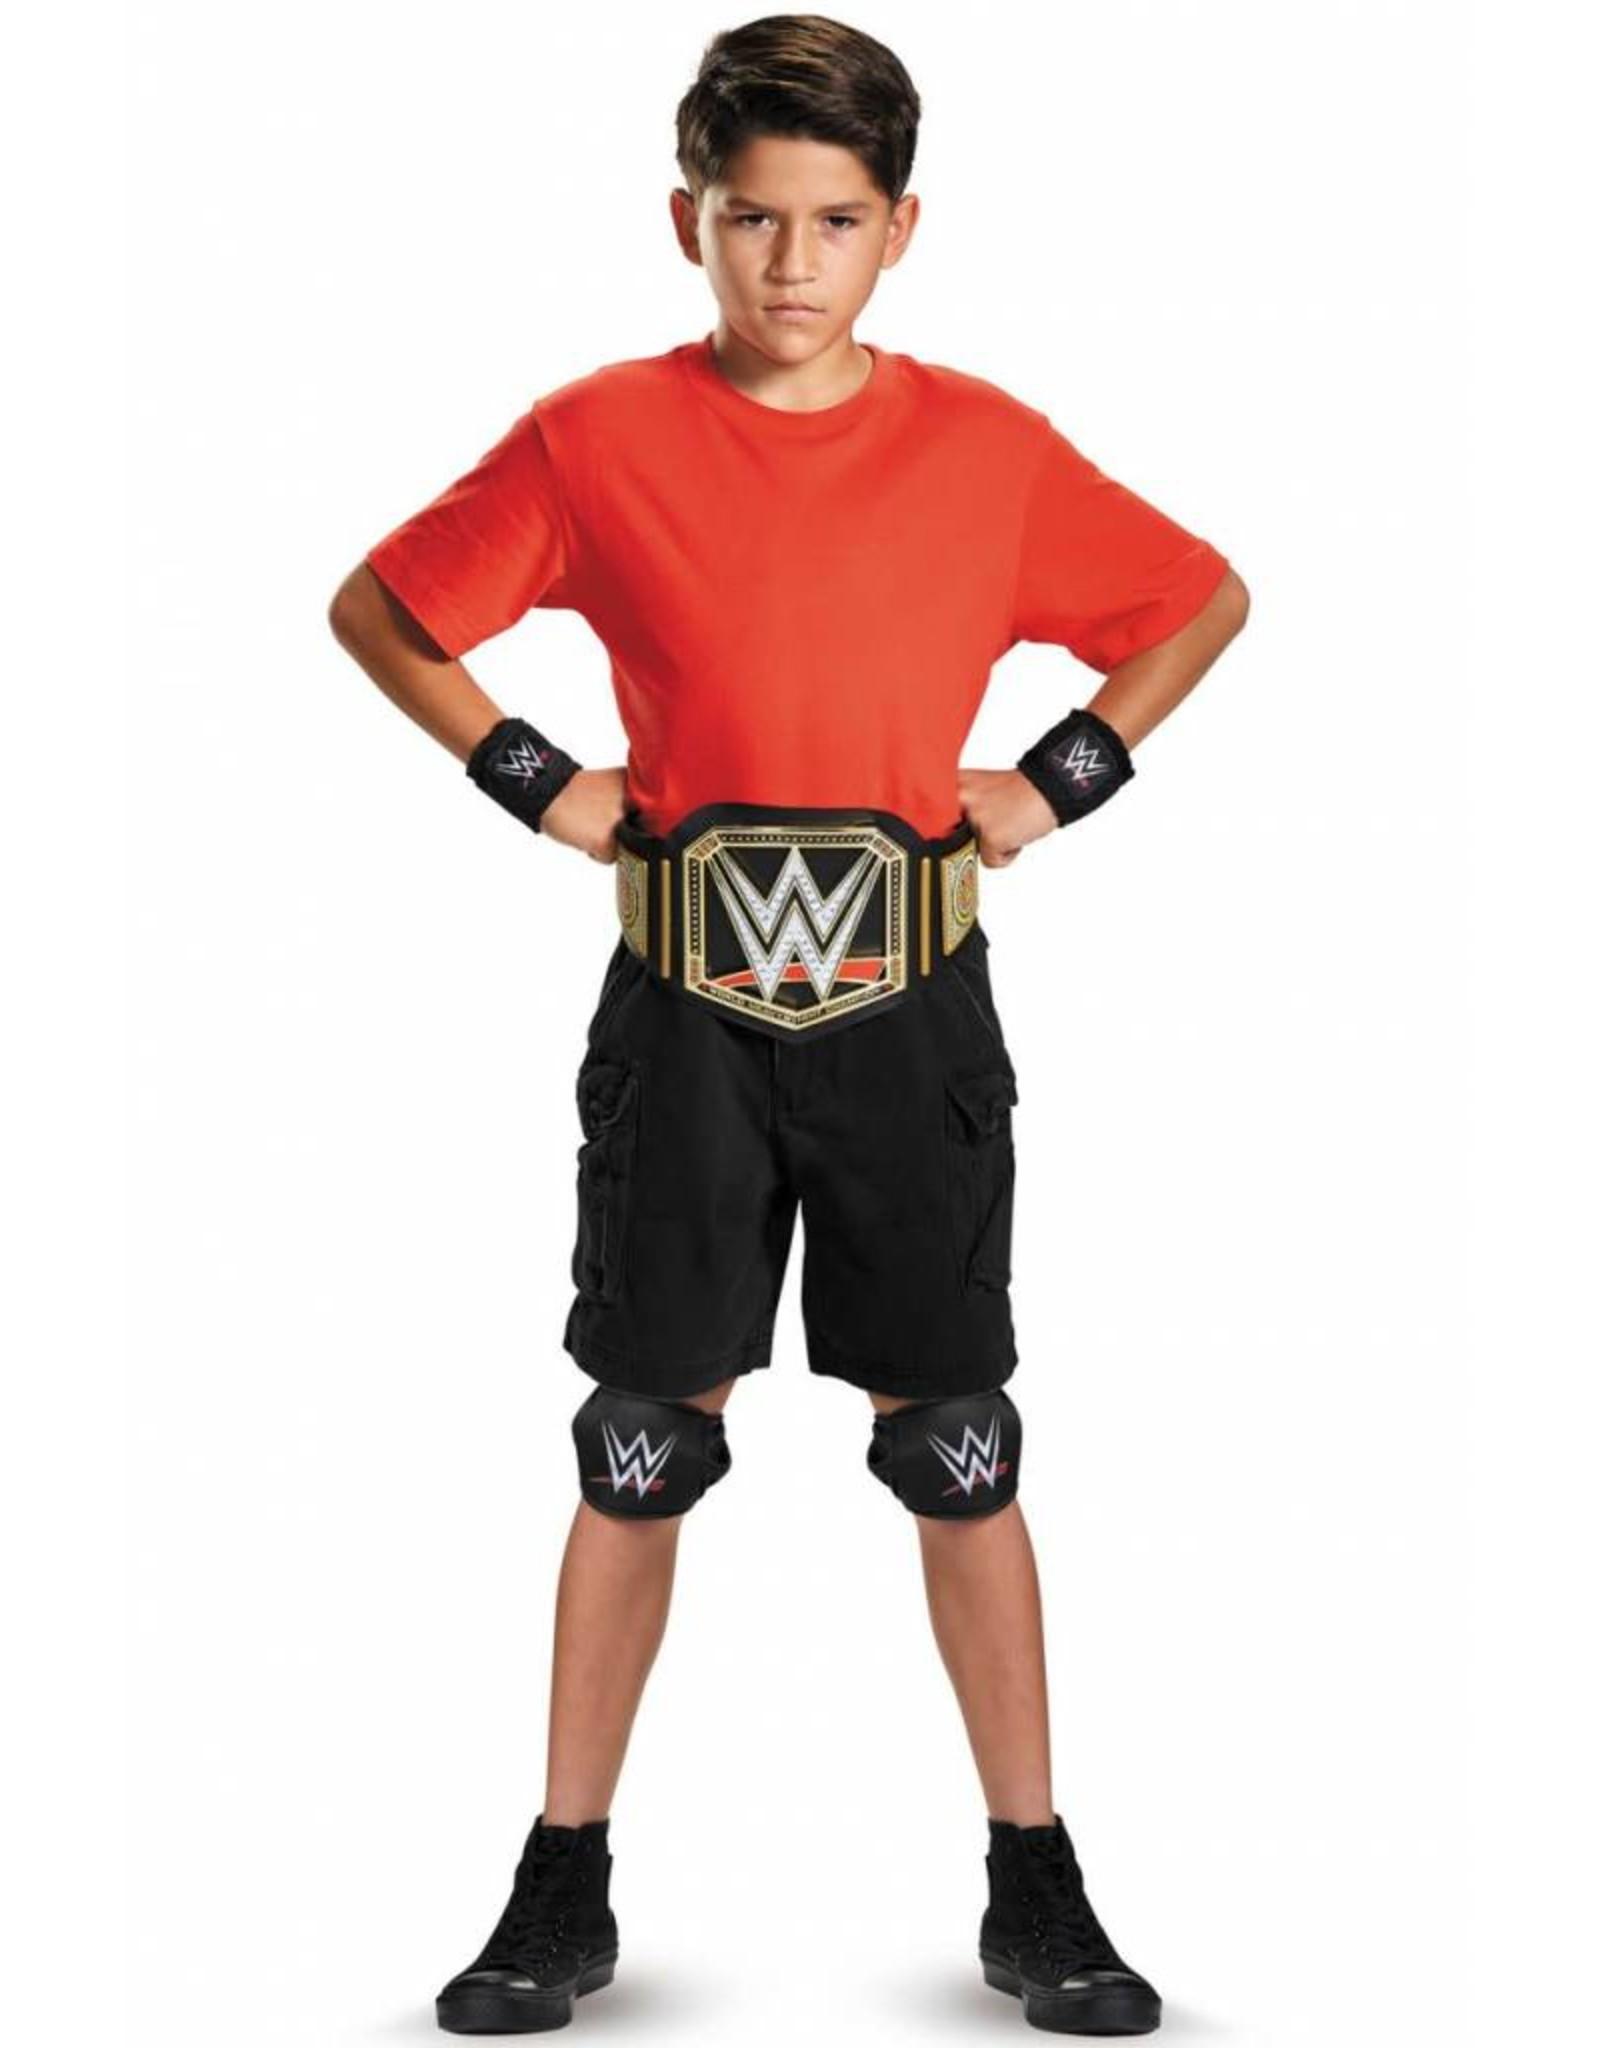 Disguise WWE Champion Kit Child